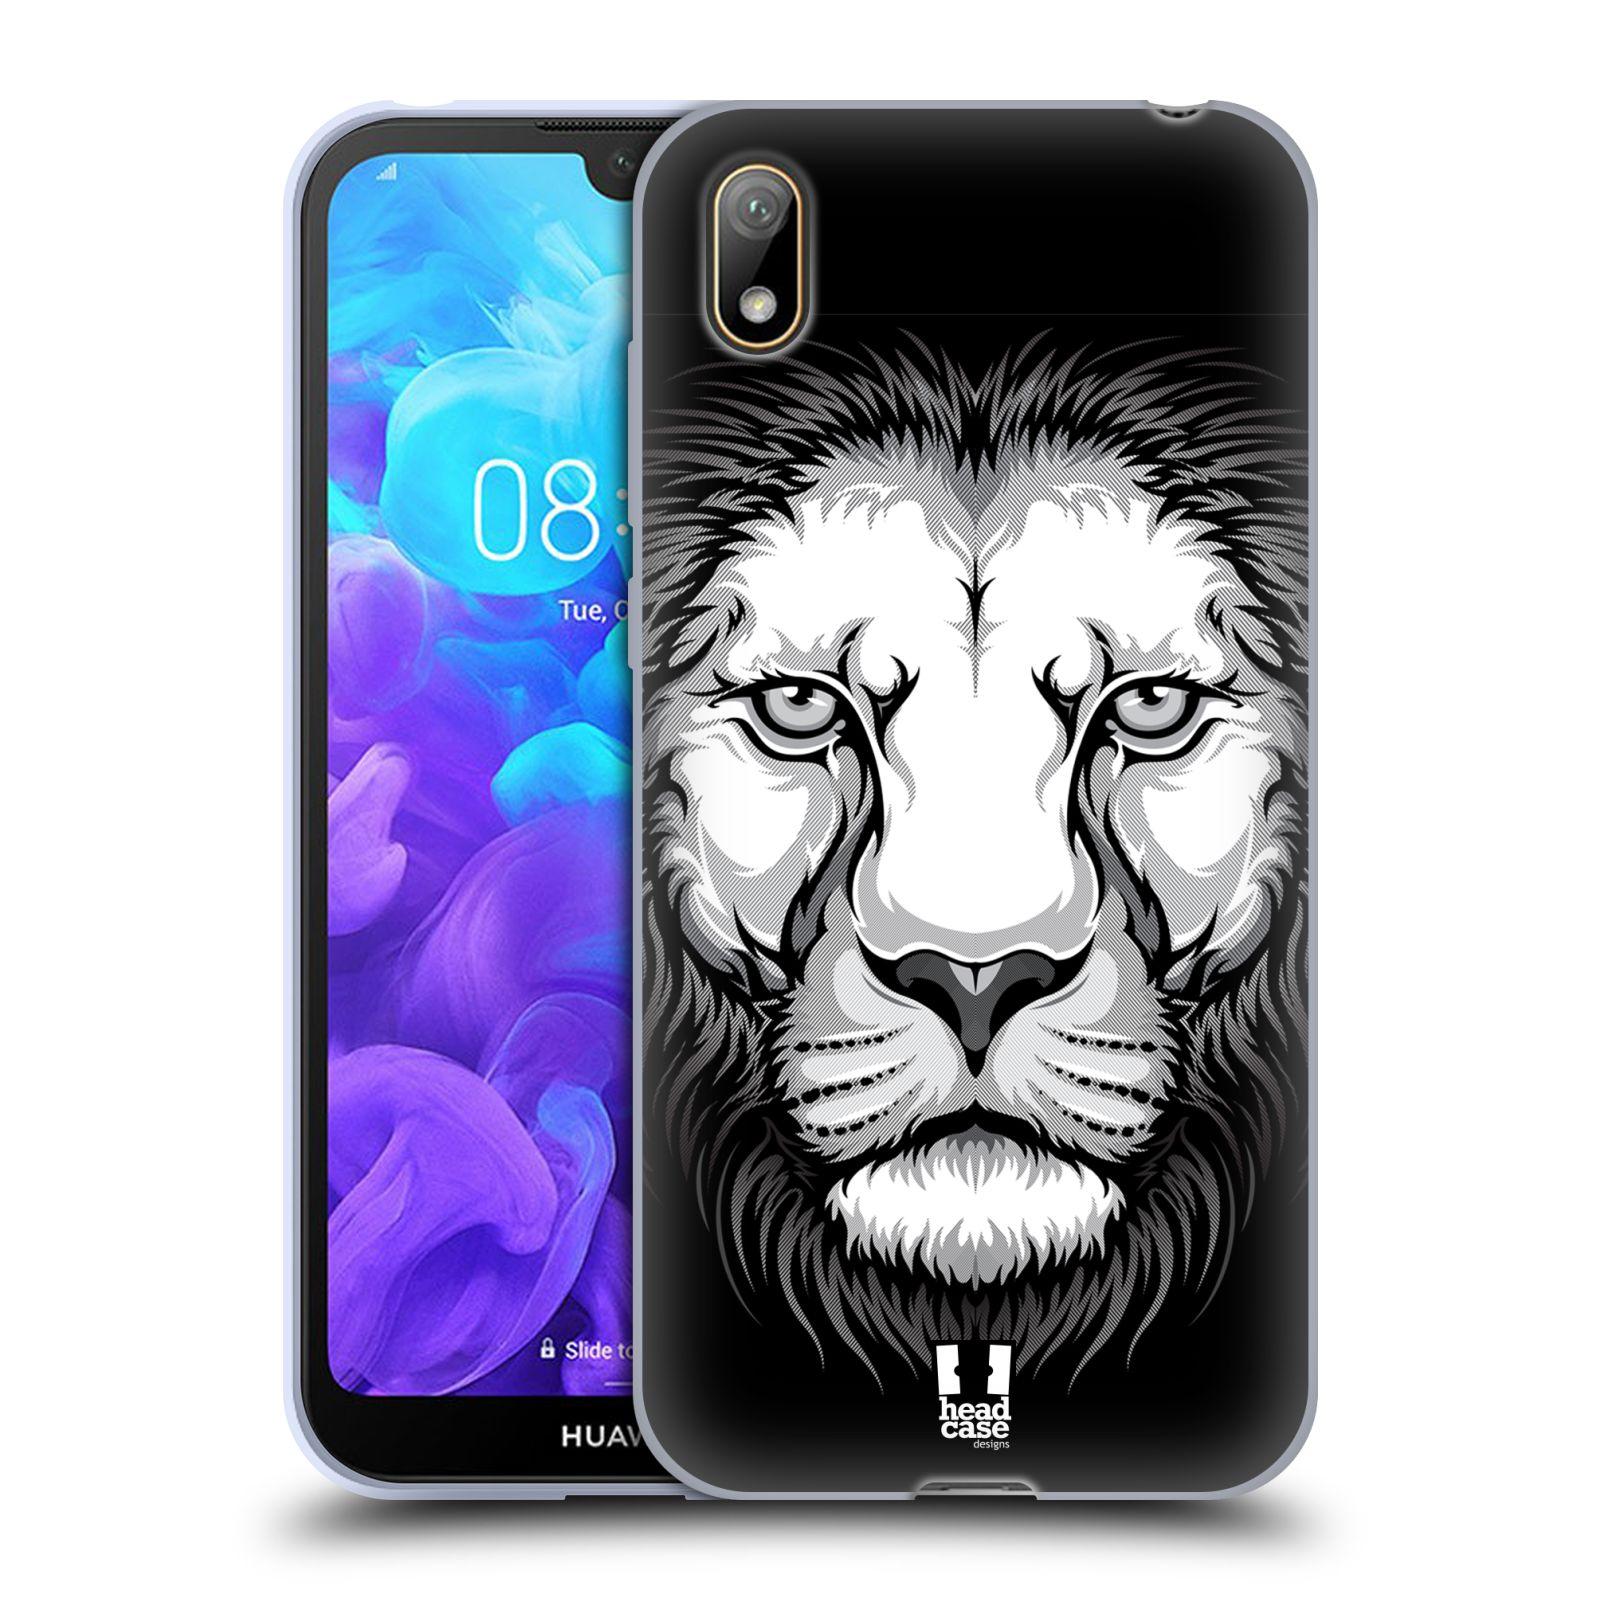 Silikonové pouzdro na mobil Huawei Y5 (2019) - Head Case - ILUSTROVANÝ LEV